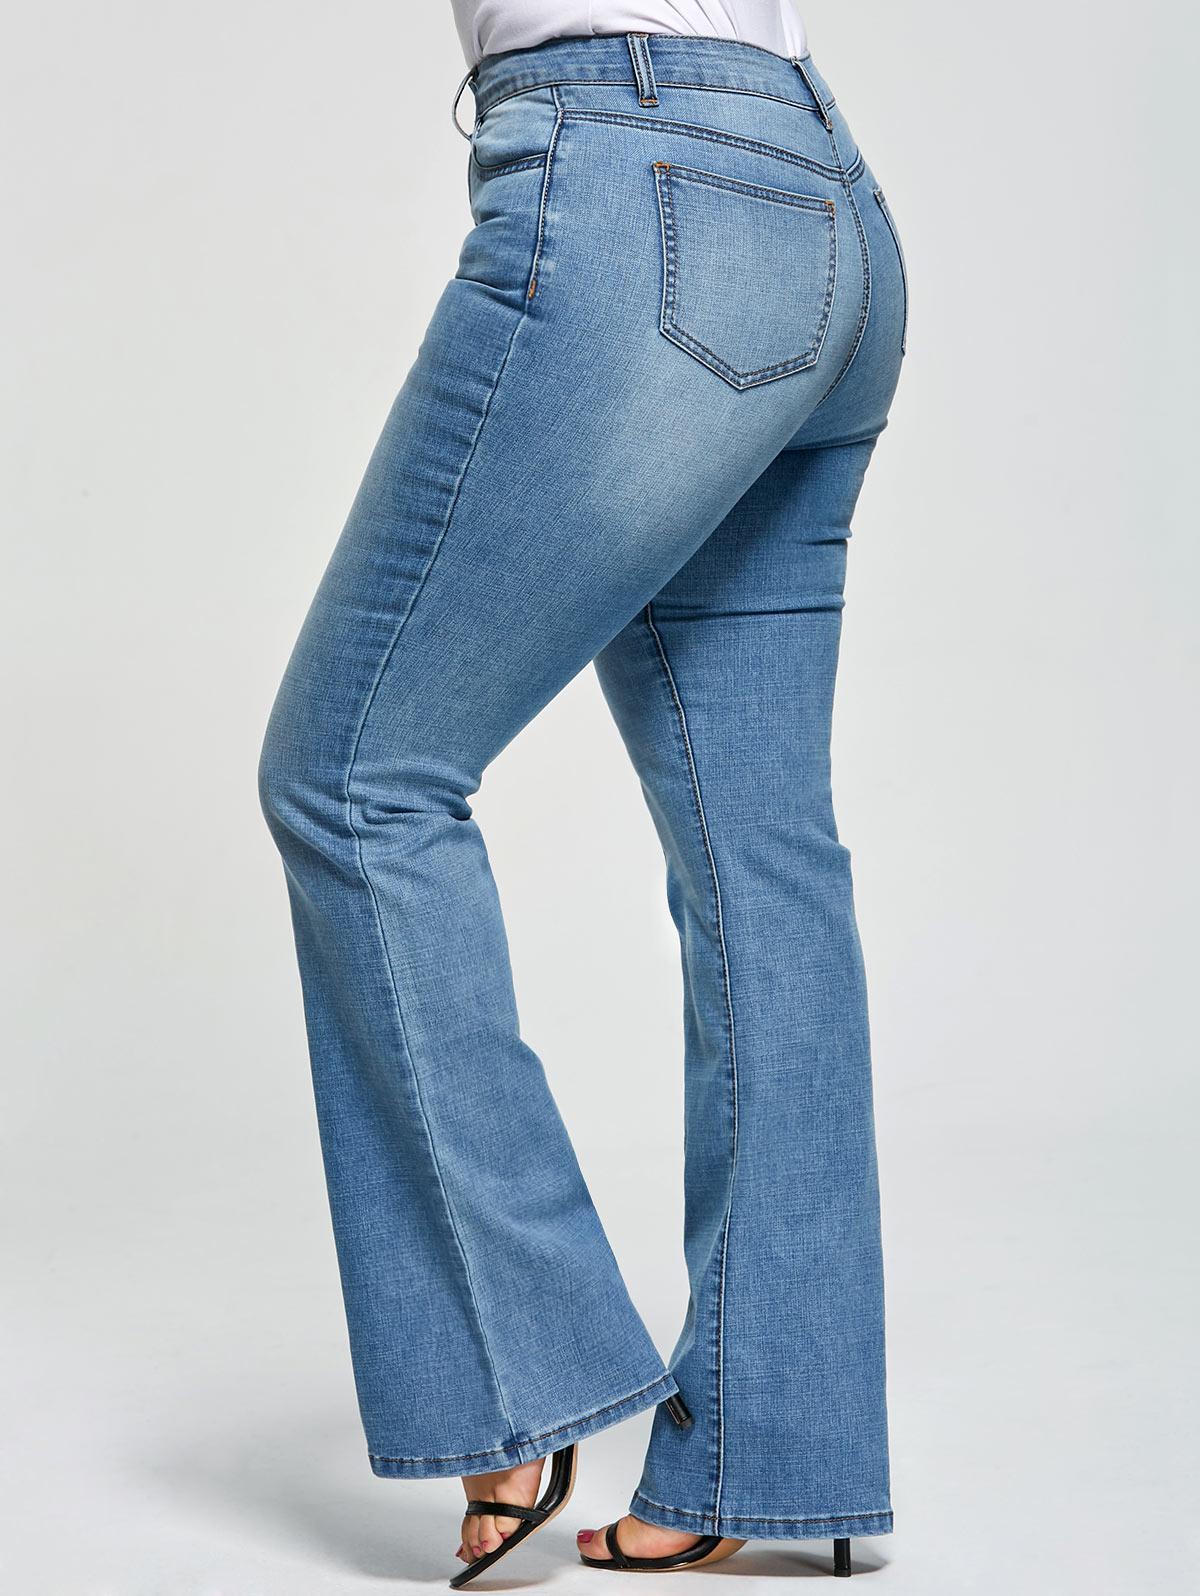 Plus Size Five Pockets Flare Jeans 220951803